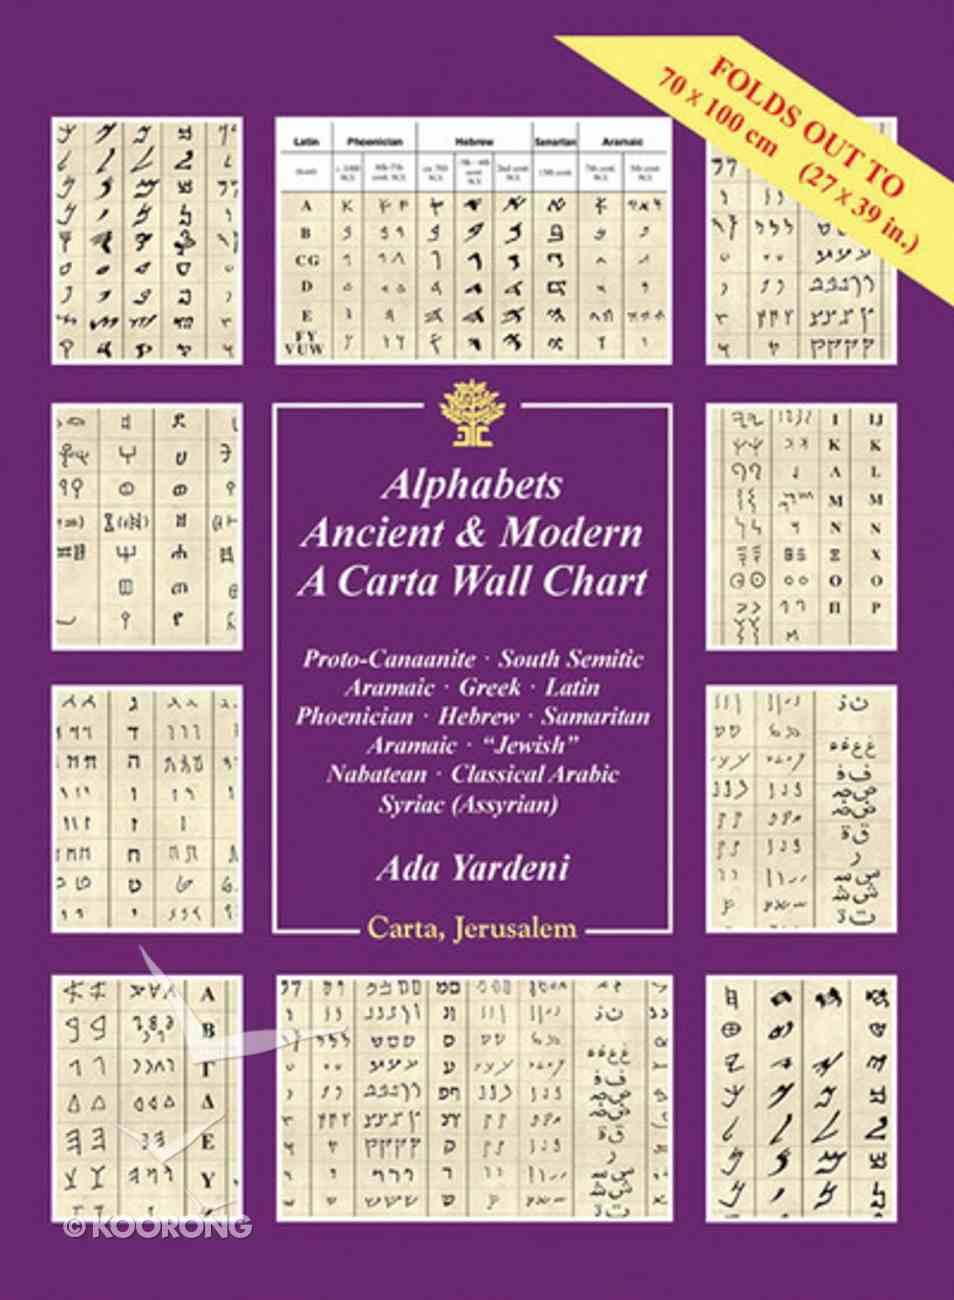 Alphabets Ancient & Modern Poster